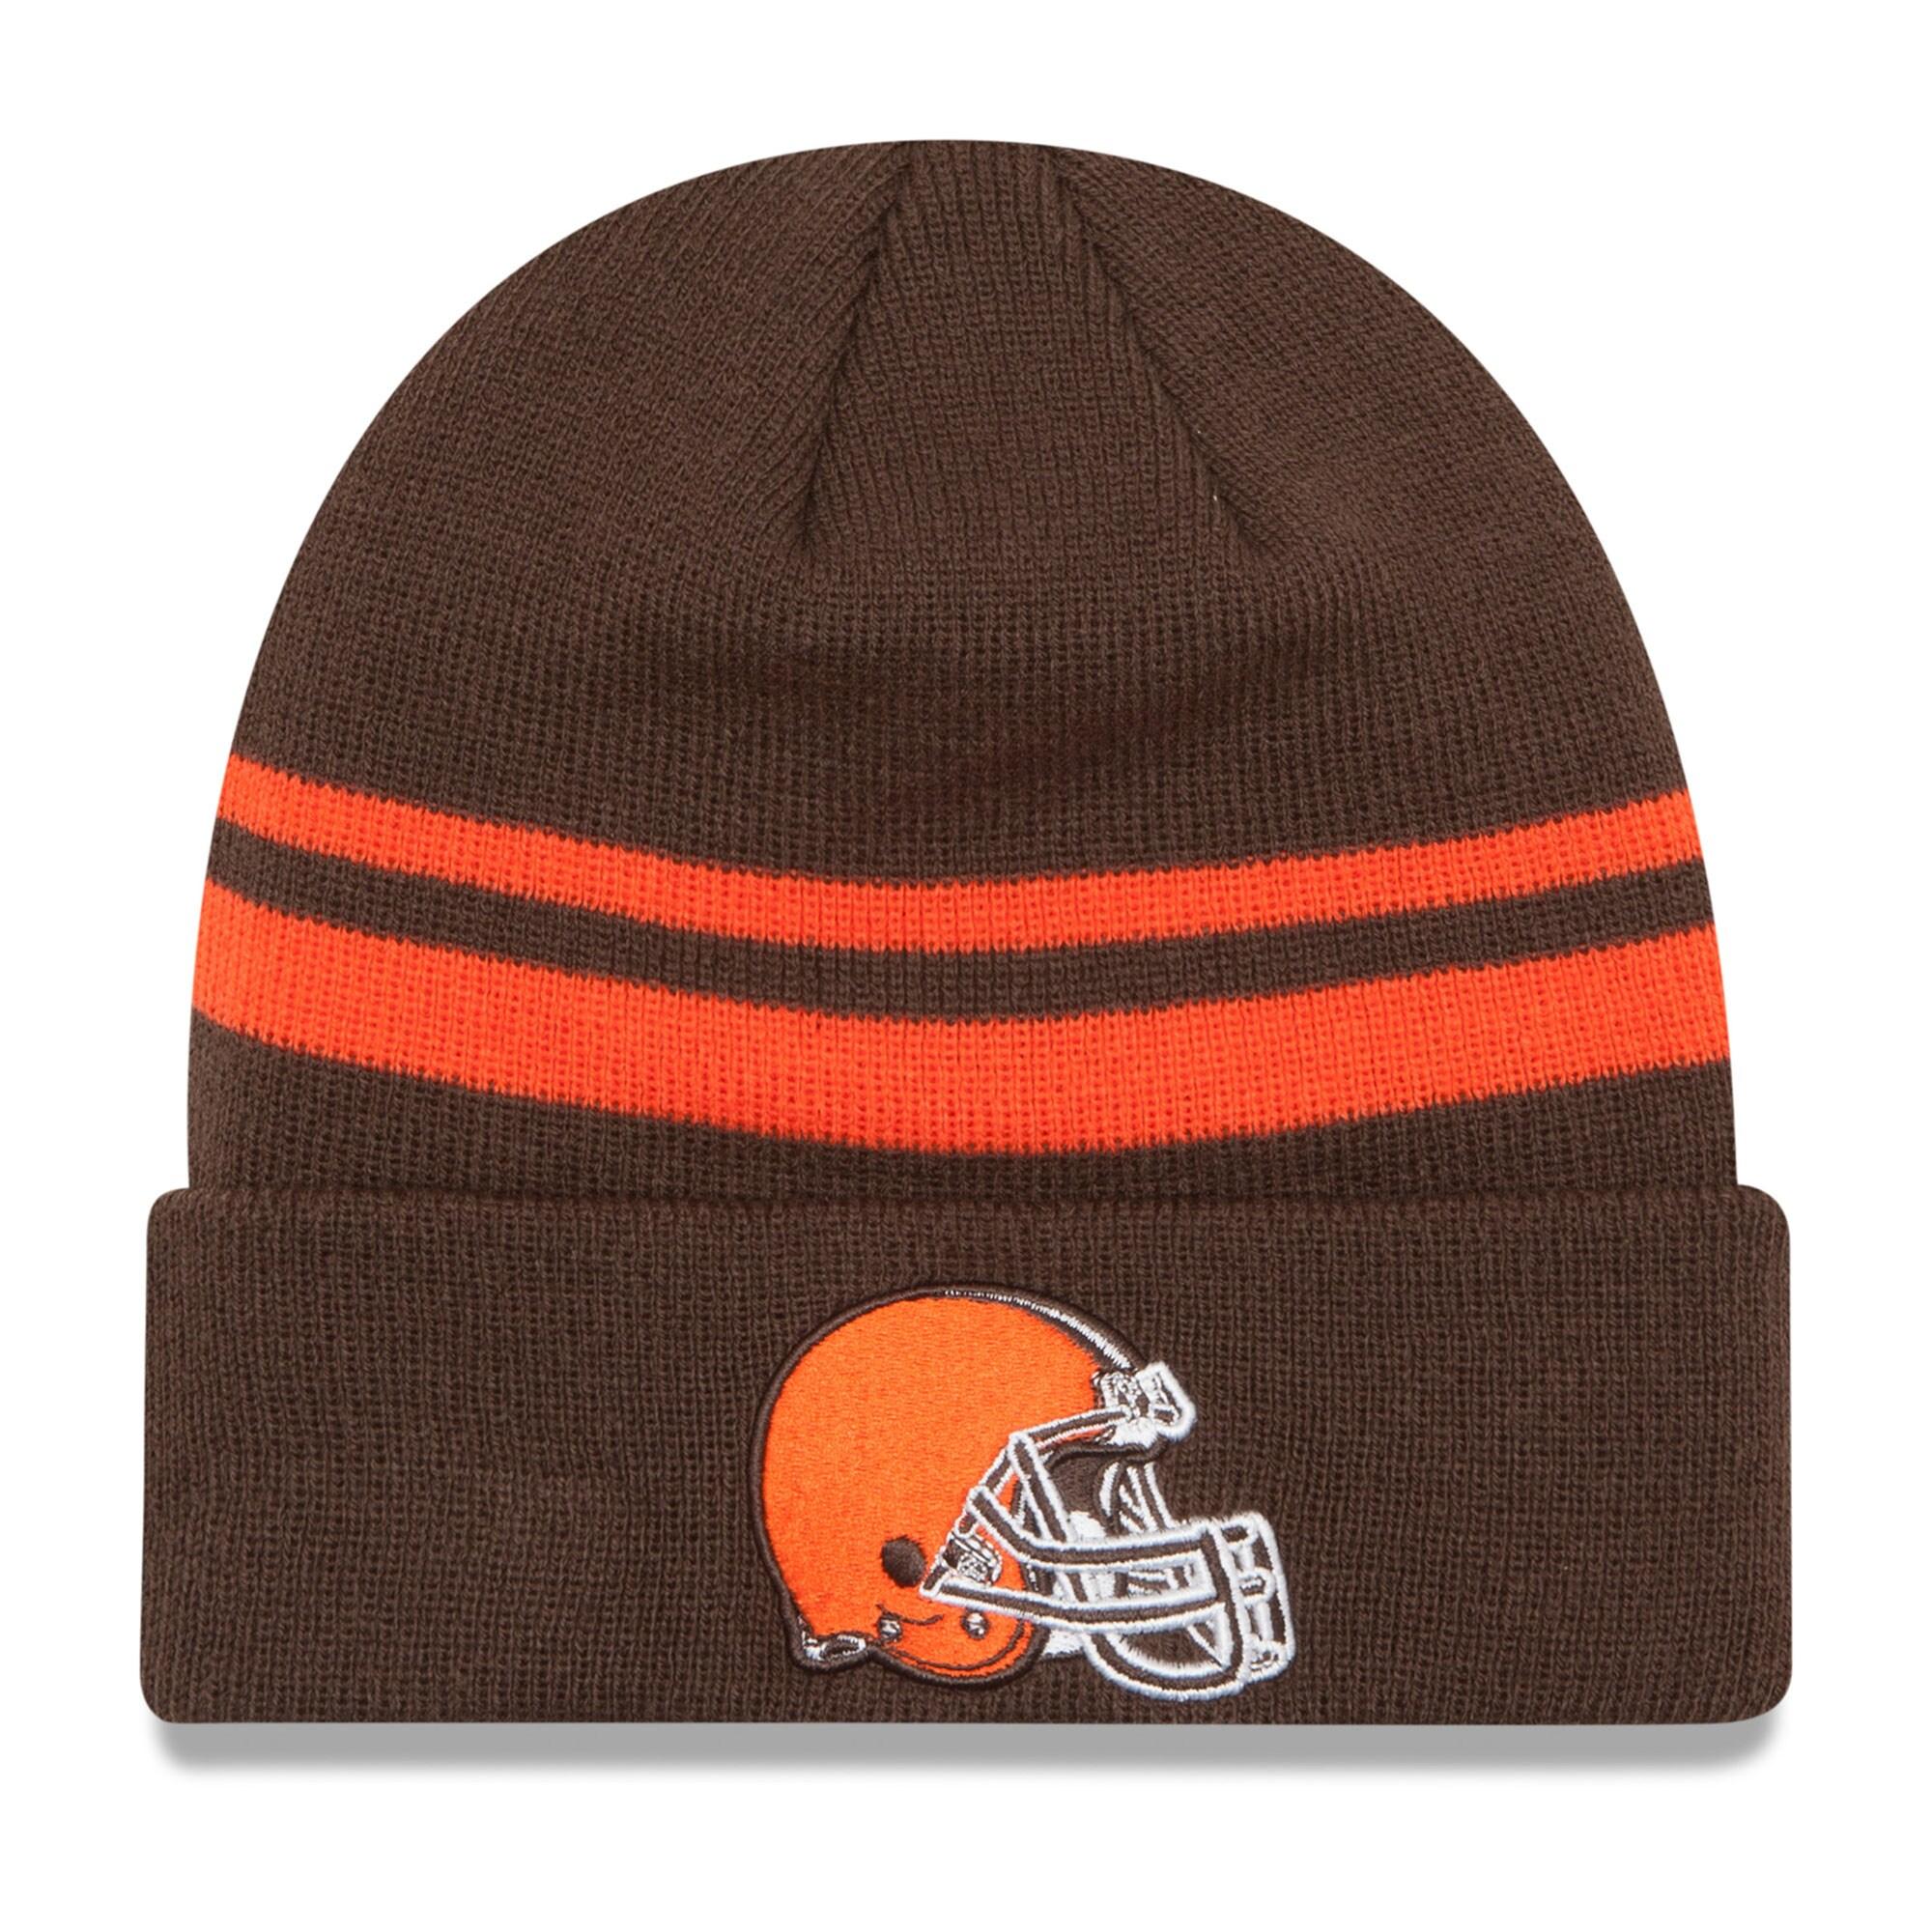 Cleveland Browns New Era Team Logo Cuffed Knit Hat - Brown